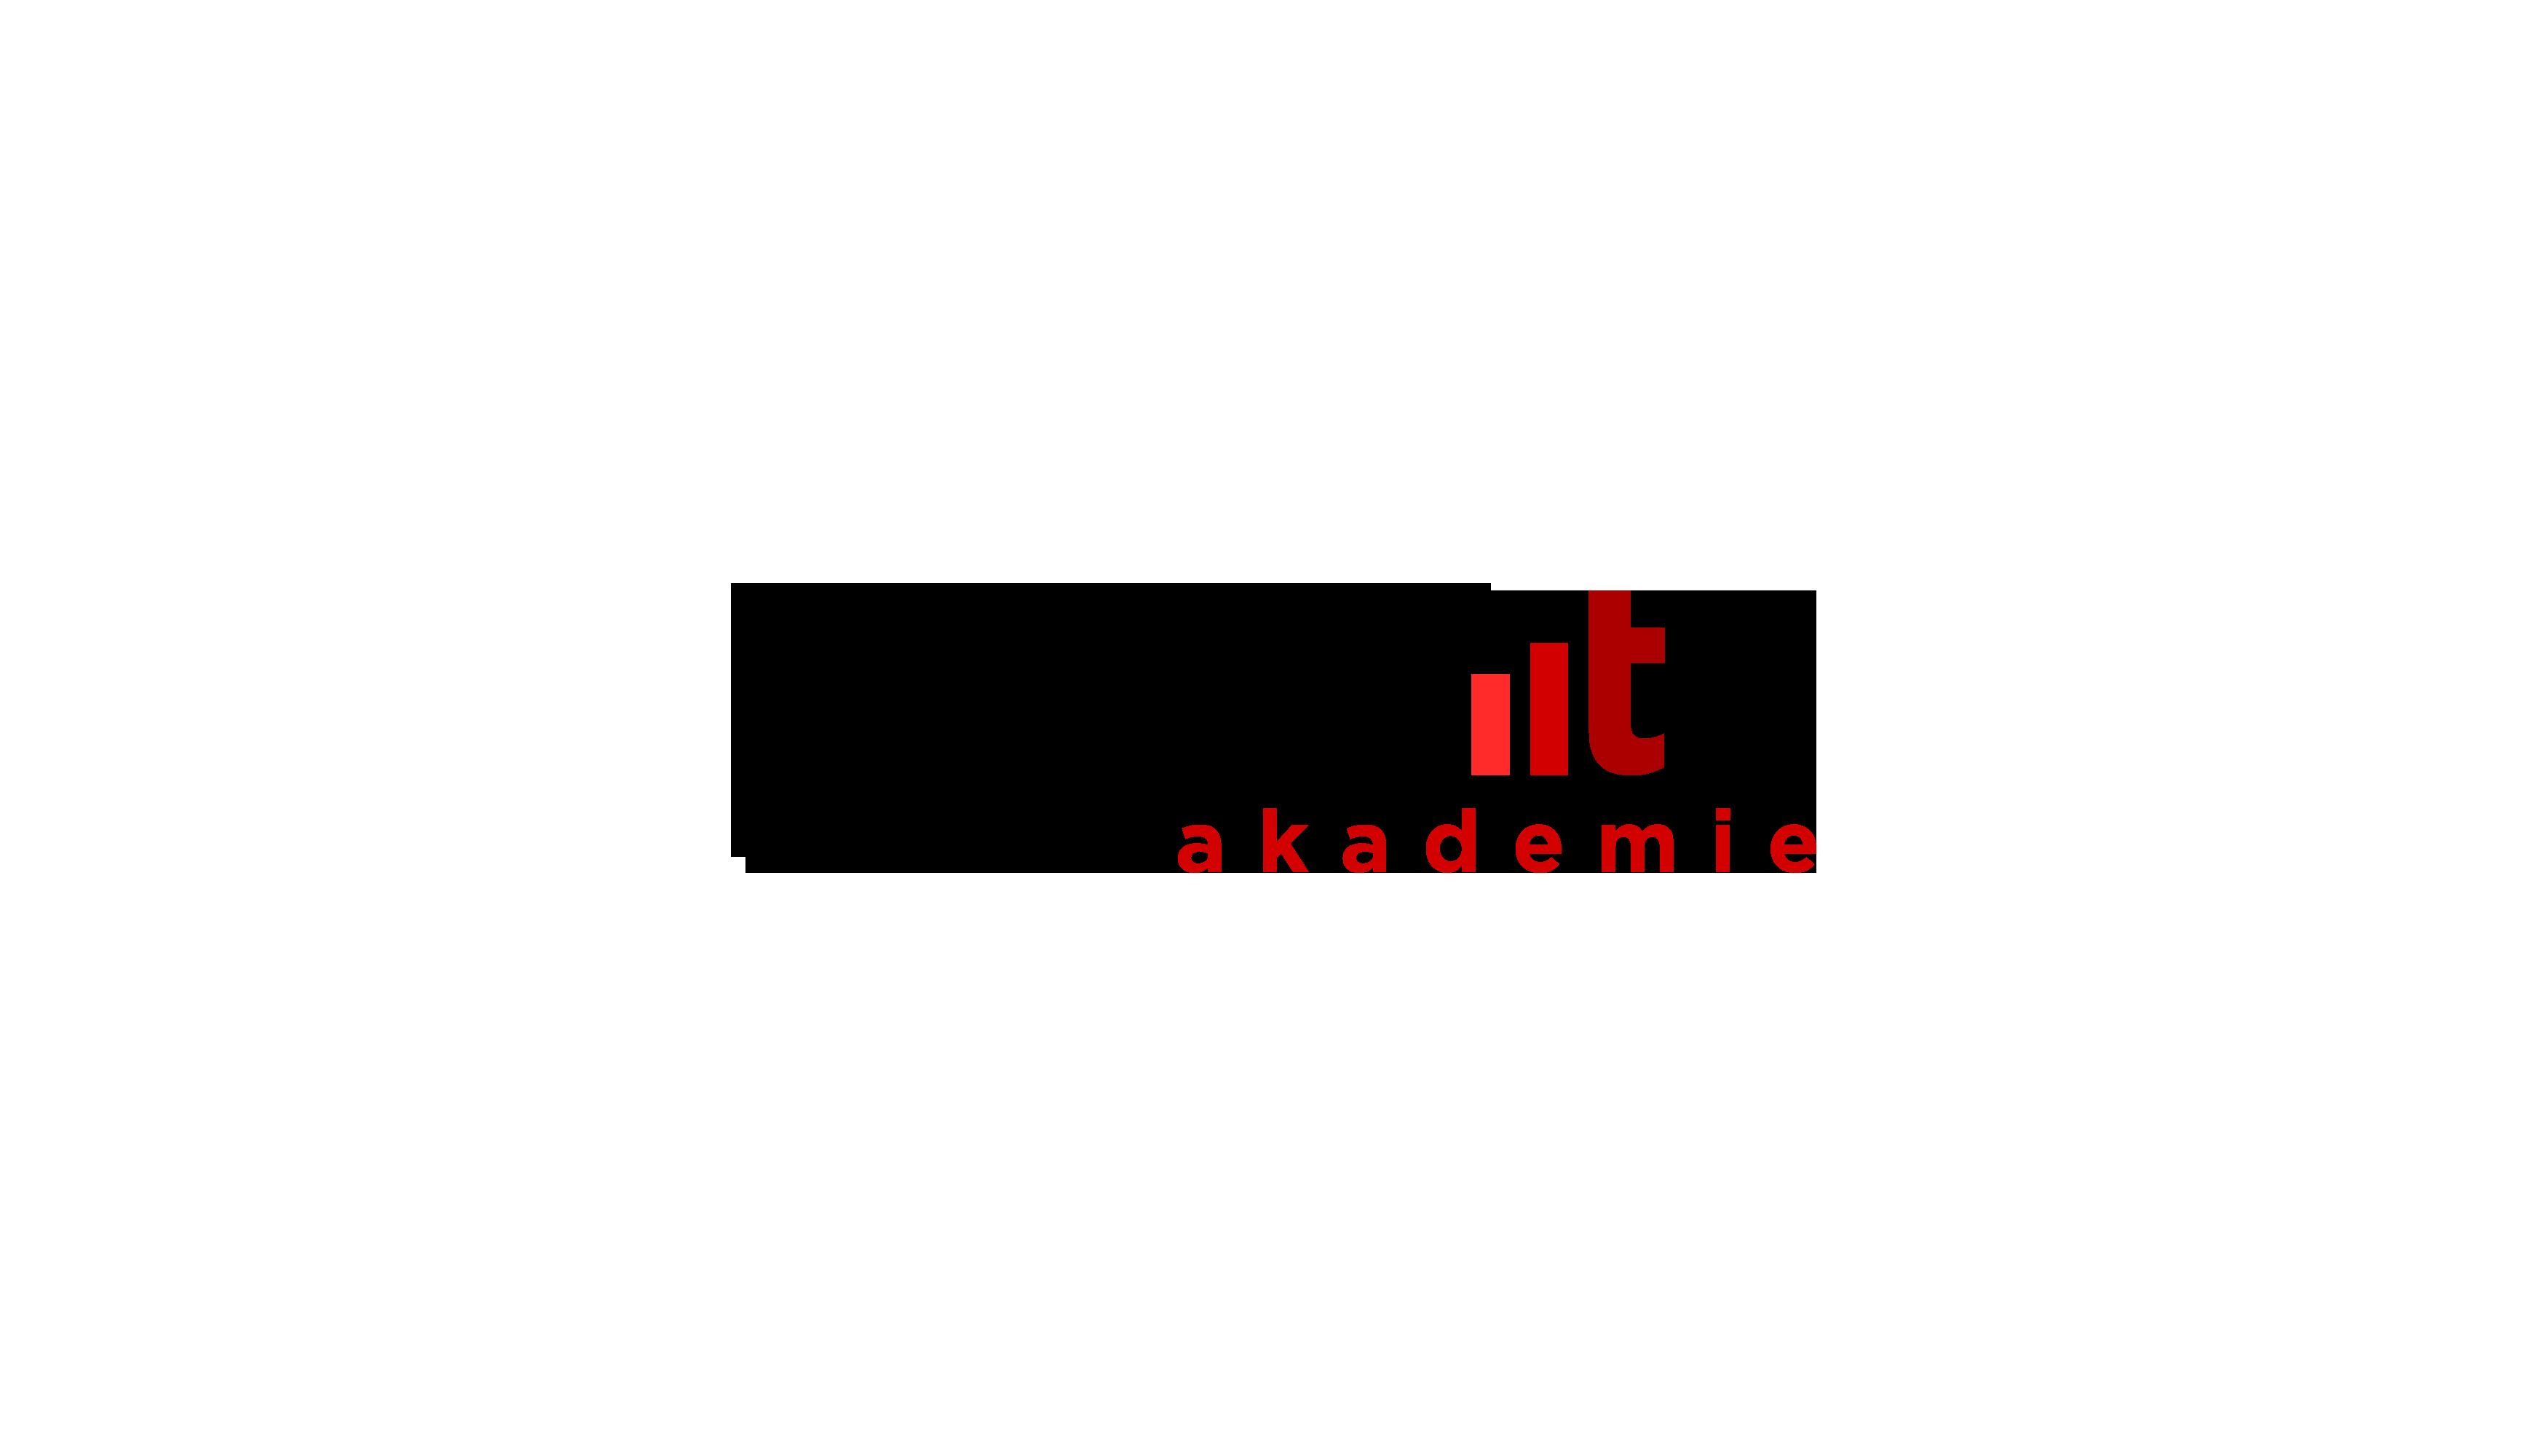 umsatzakademie.com